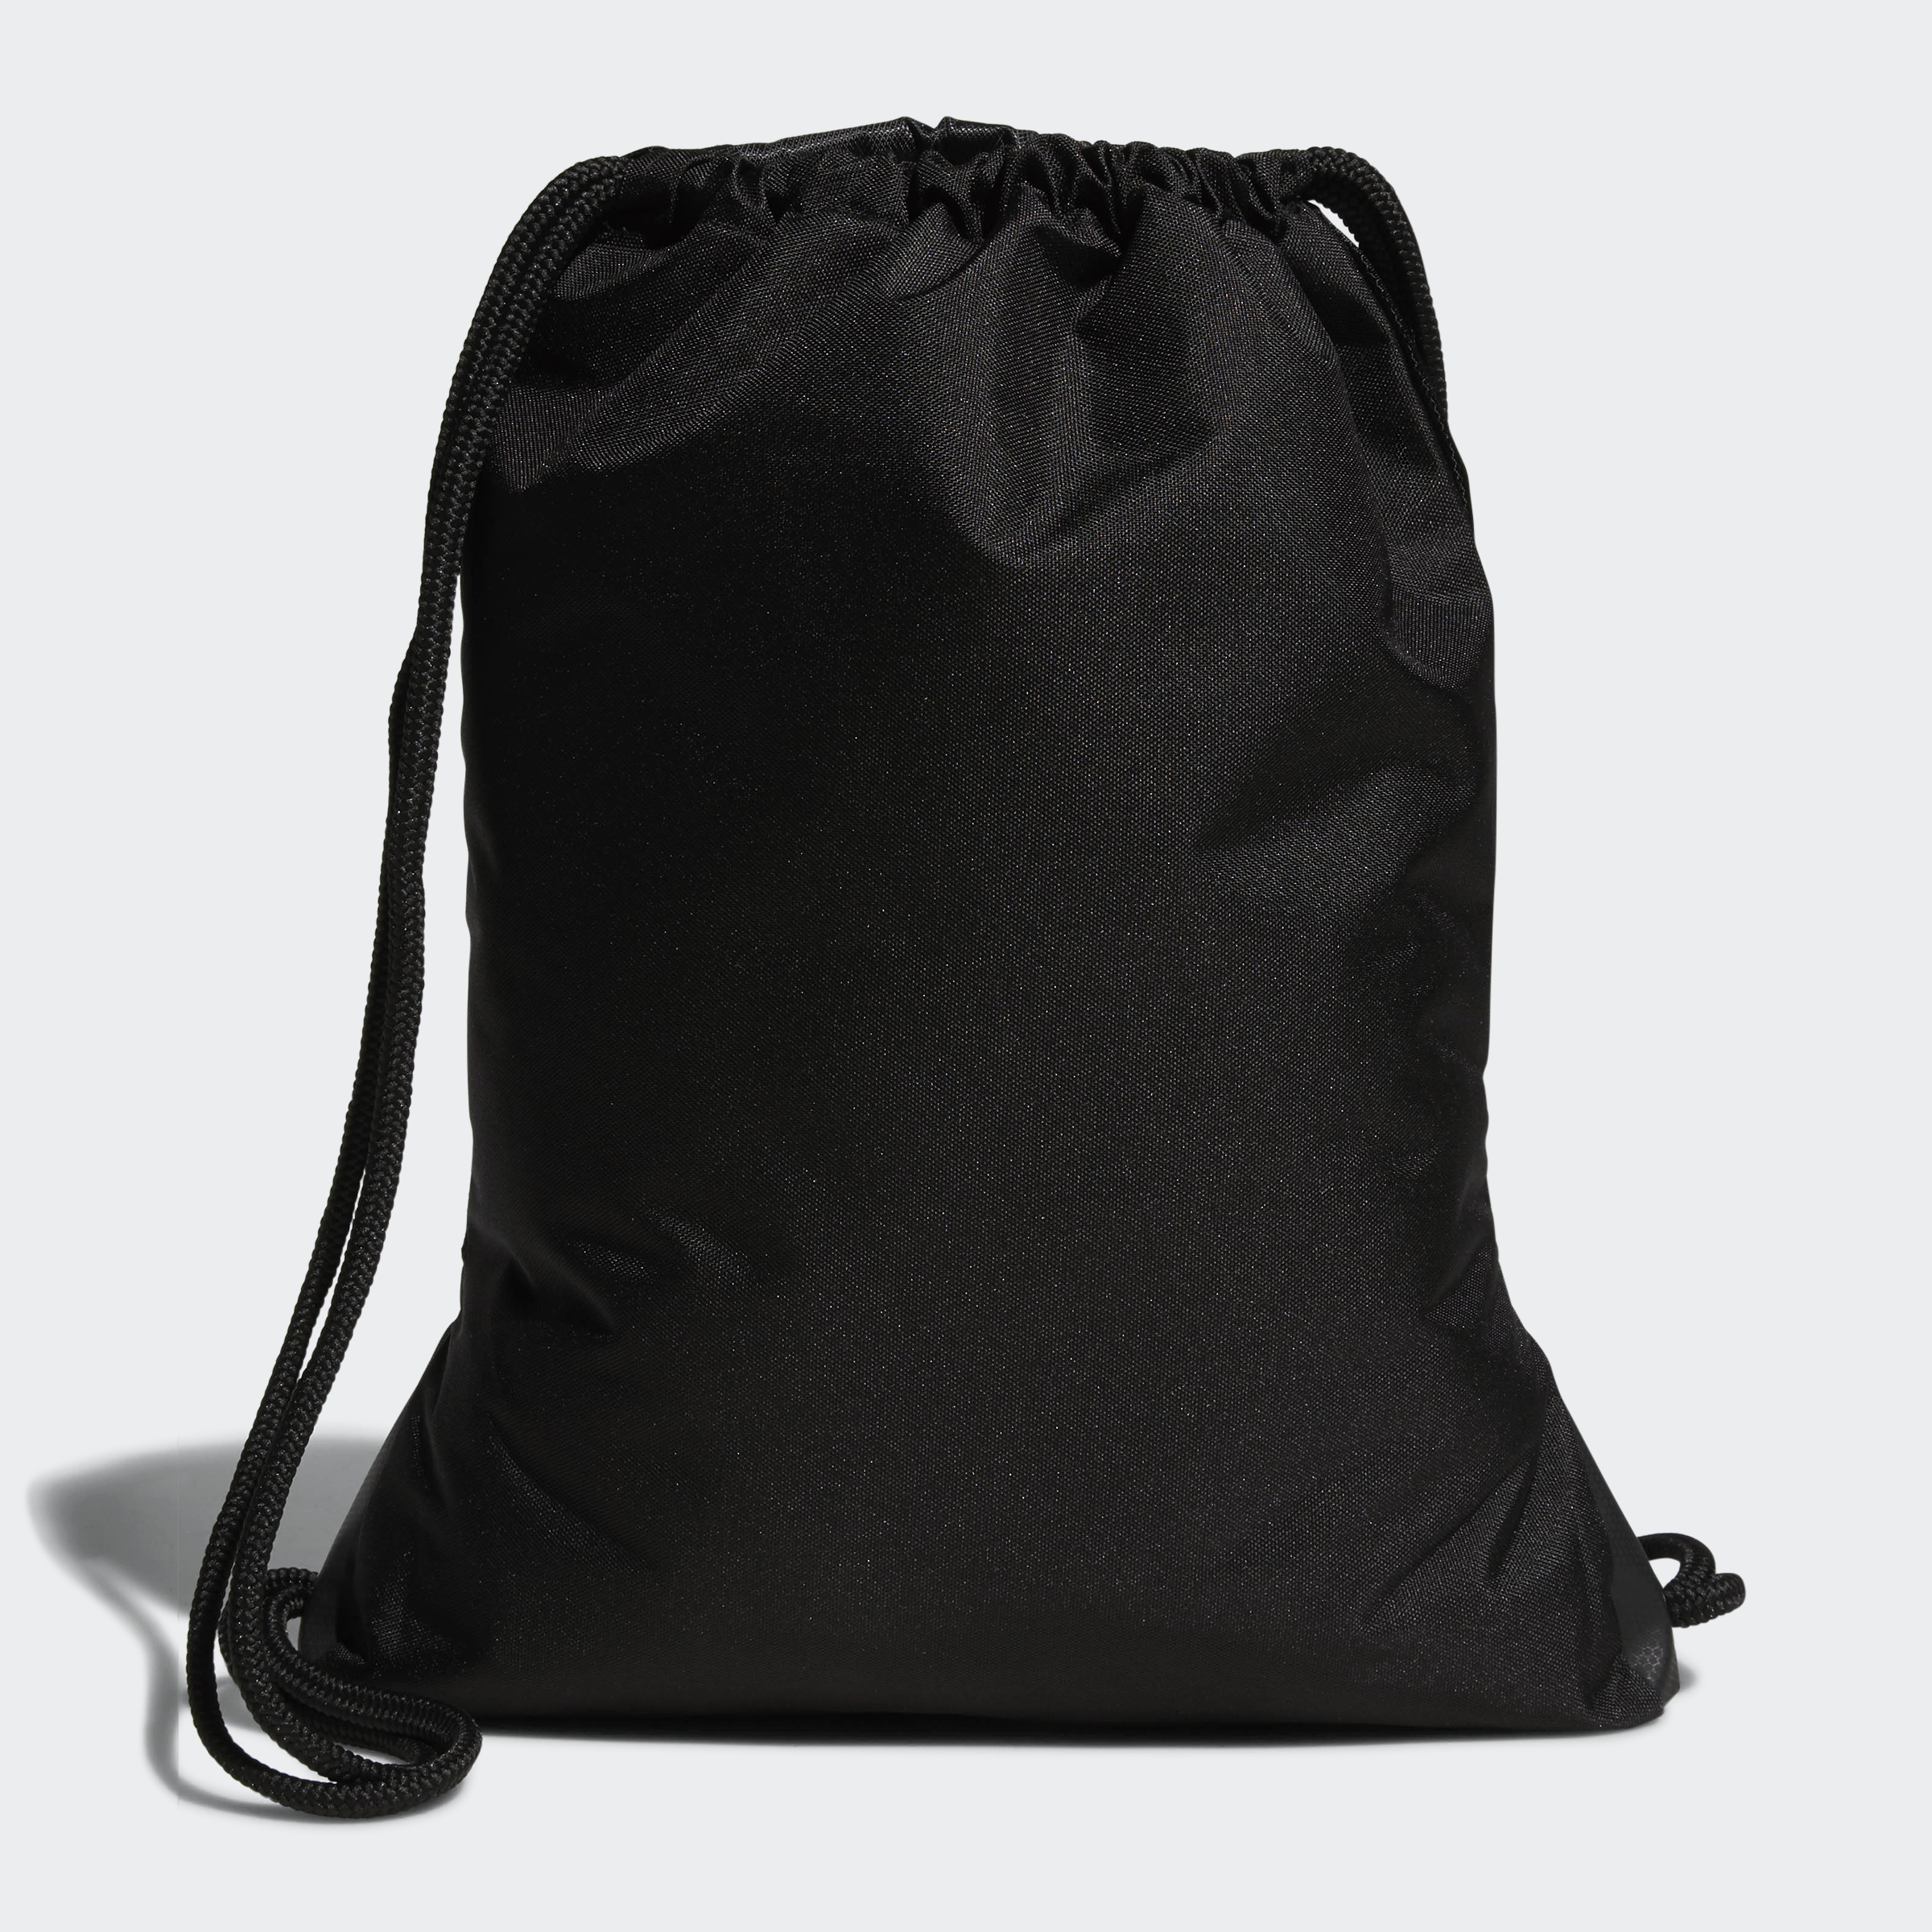 adidas-Lightning-Sackpack-Bags thumbnail 16